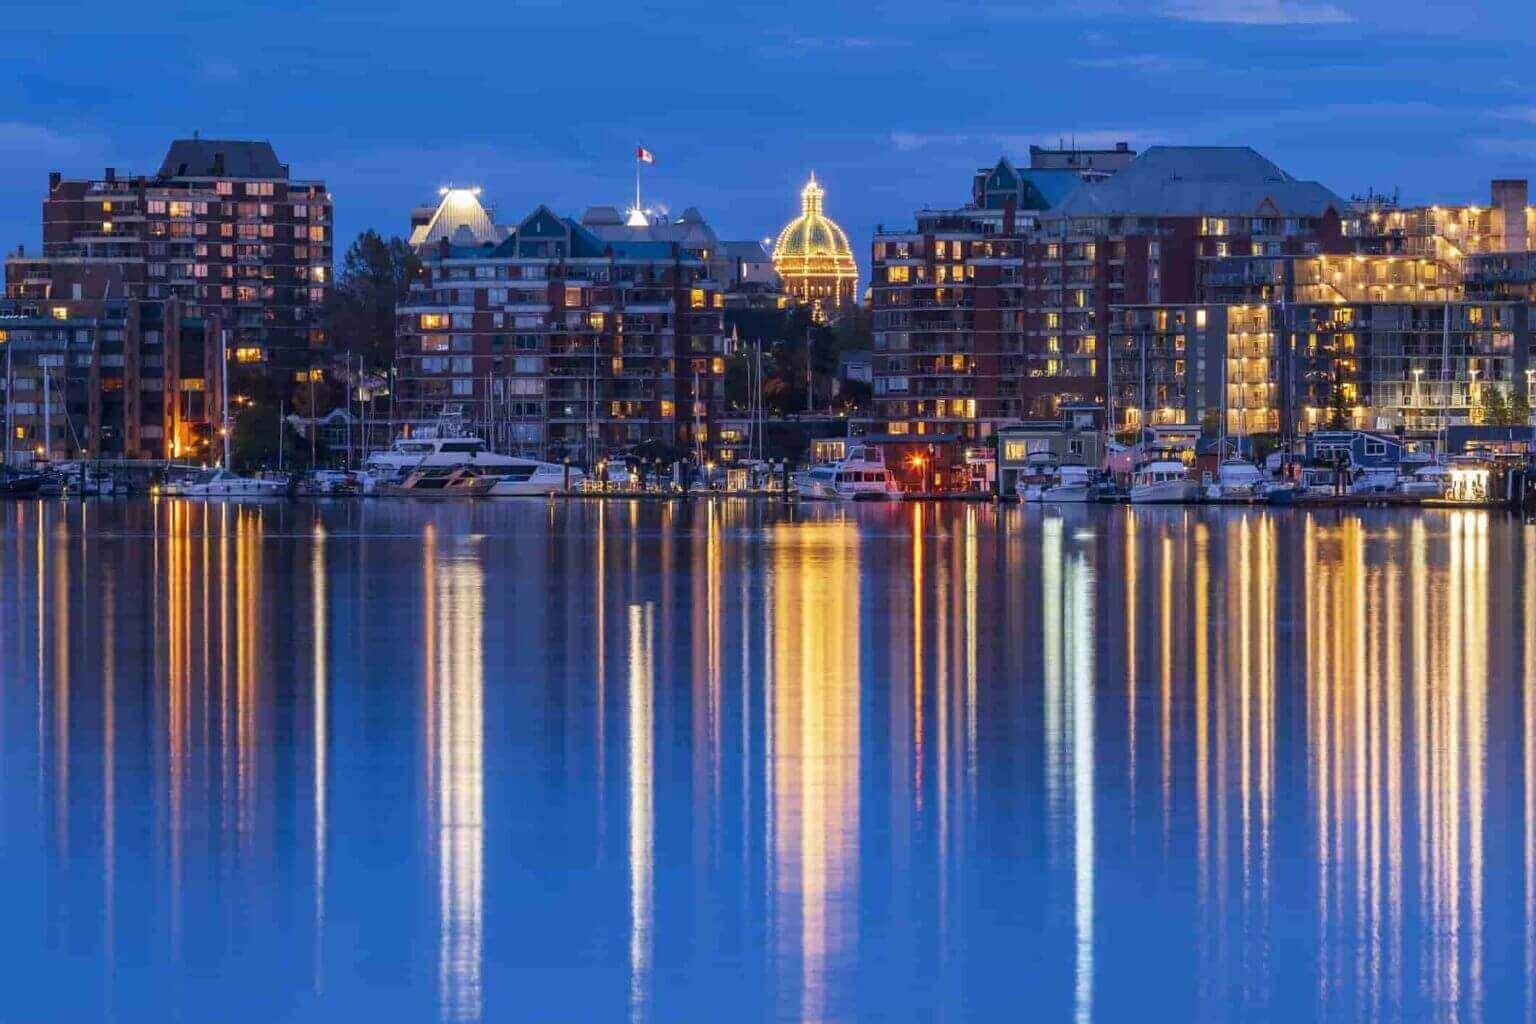 Victoria, BC, Skyline at night